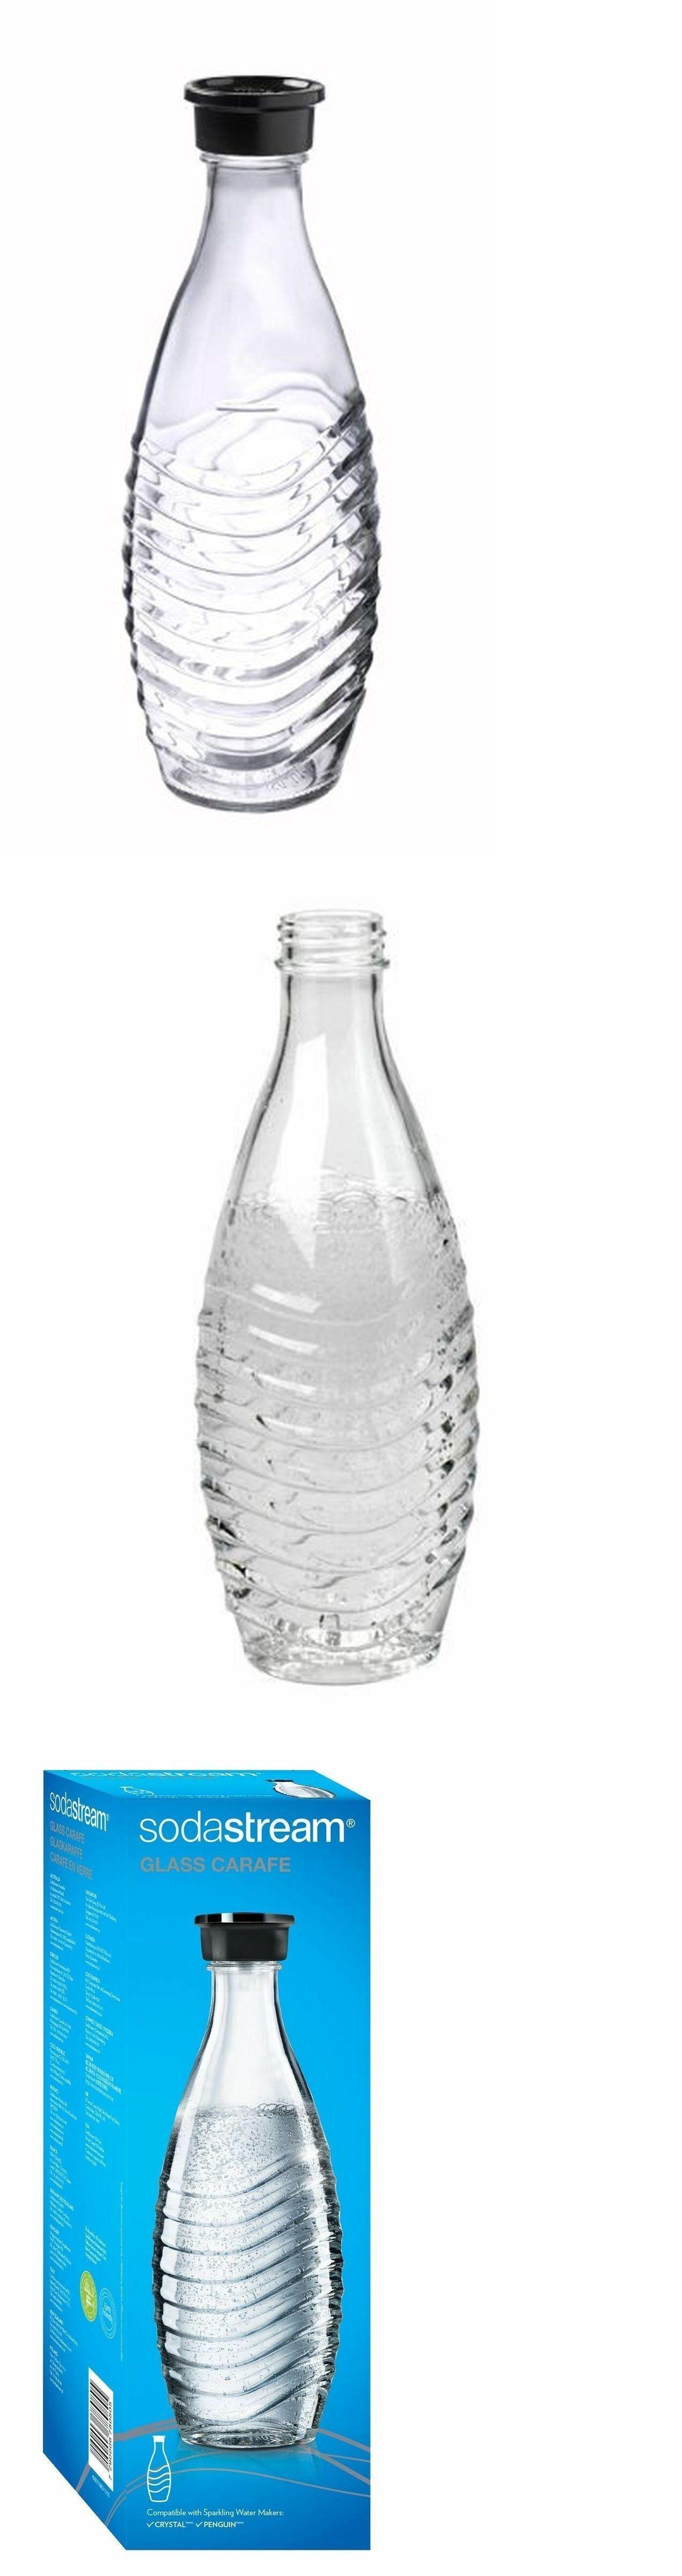 SodaStream 620-mL Glass Carafe